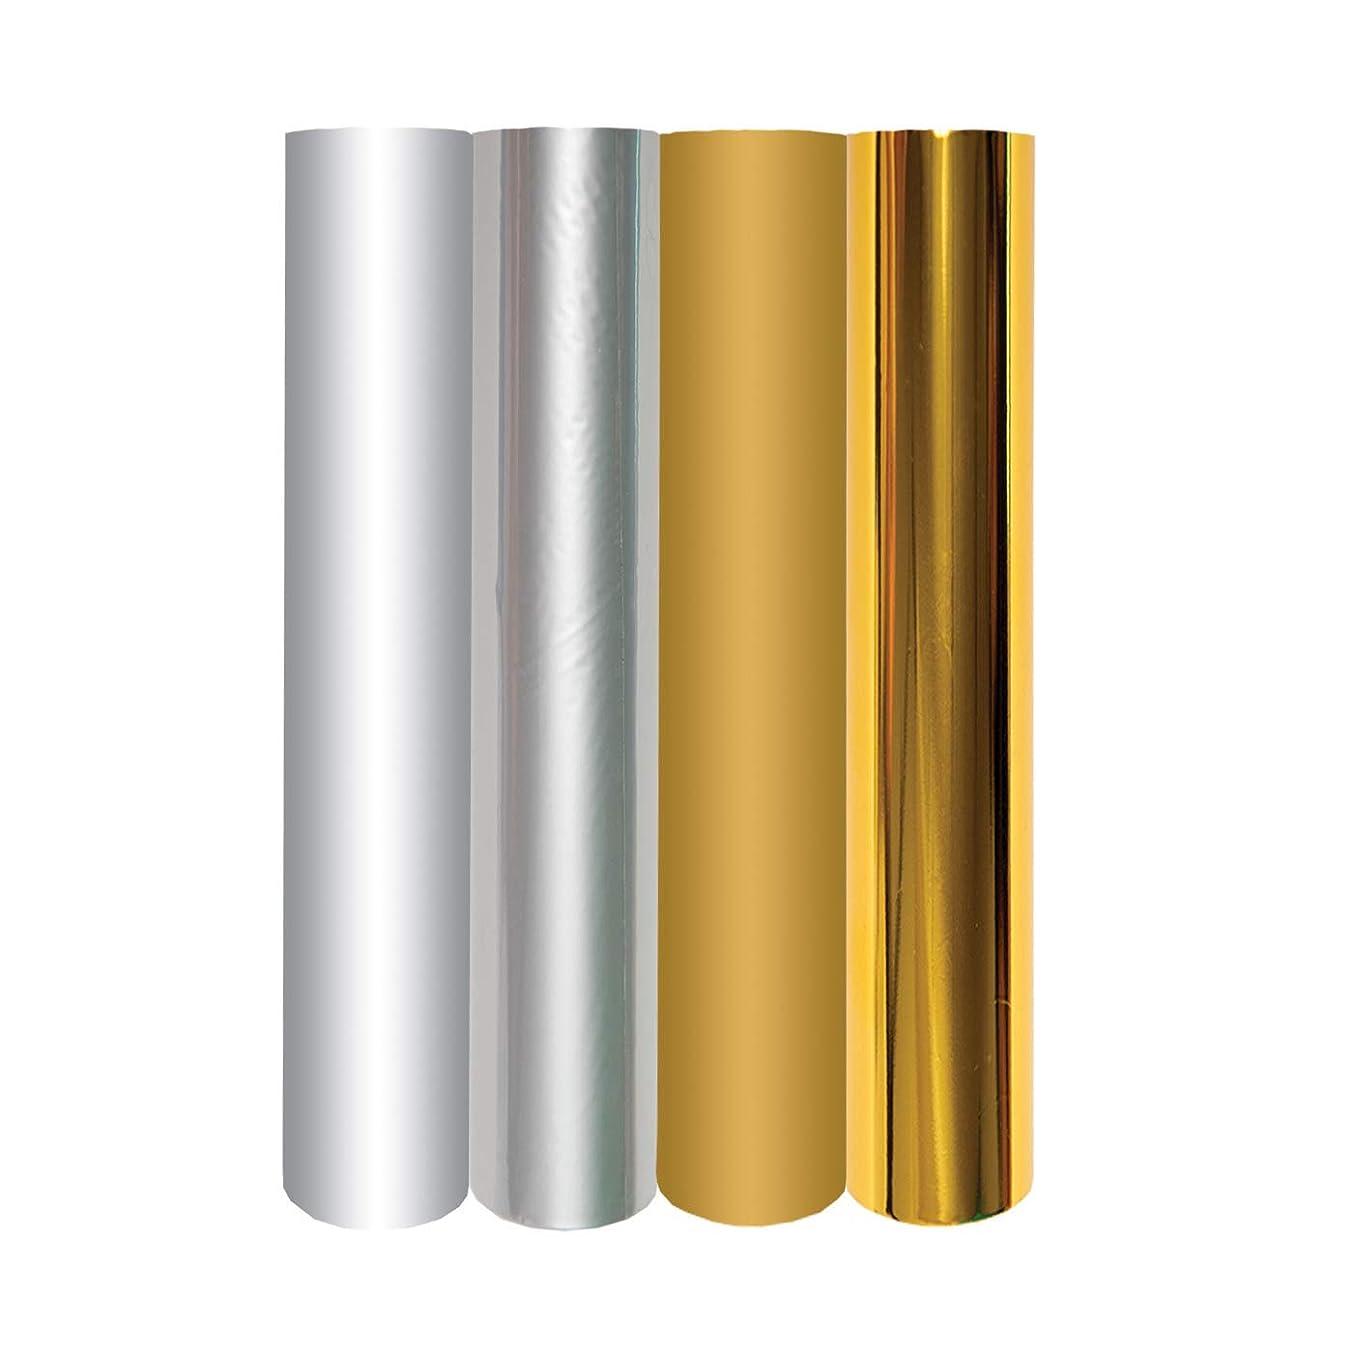 Spellbinders GLF-011 4 Metallic Gold & Silver Variety Pack Glimmer Hot Foil Roll, Multicolor